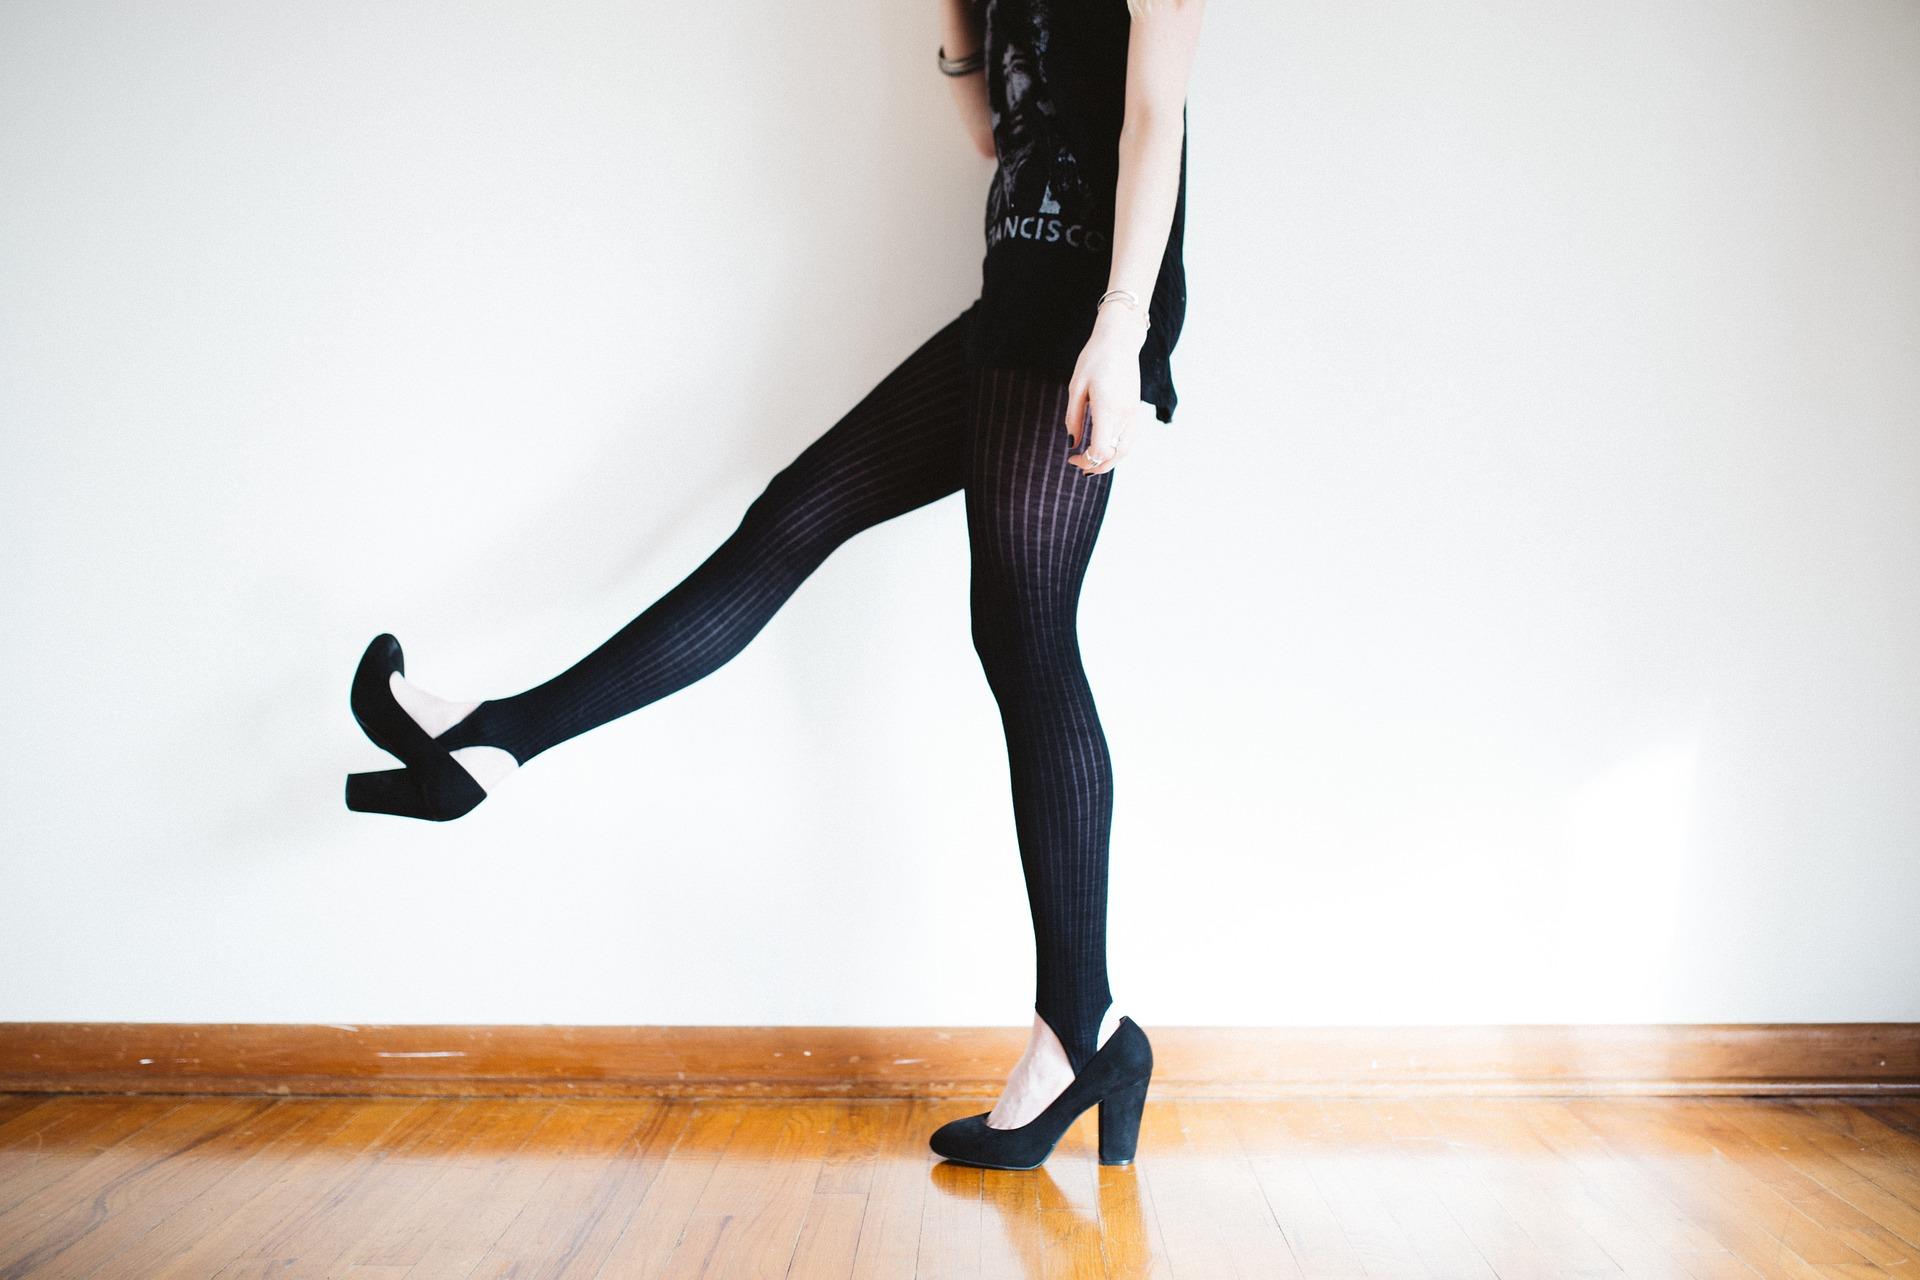 8a2505148452a Shirts For Leggings Kohls - DREAMWORKS